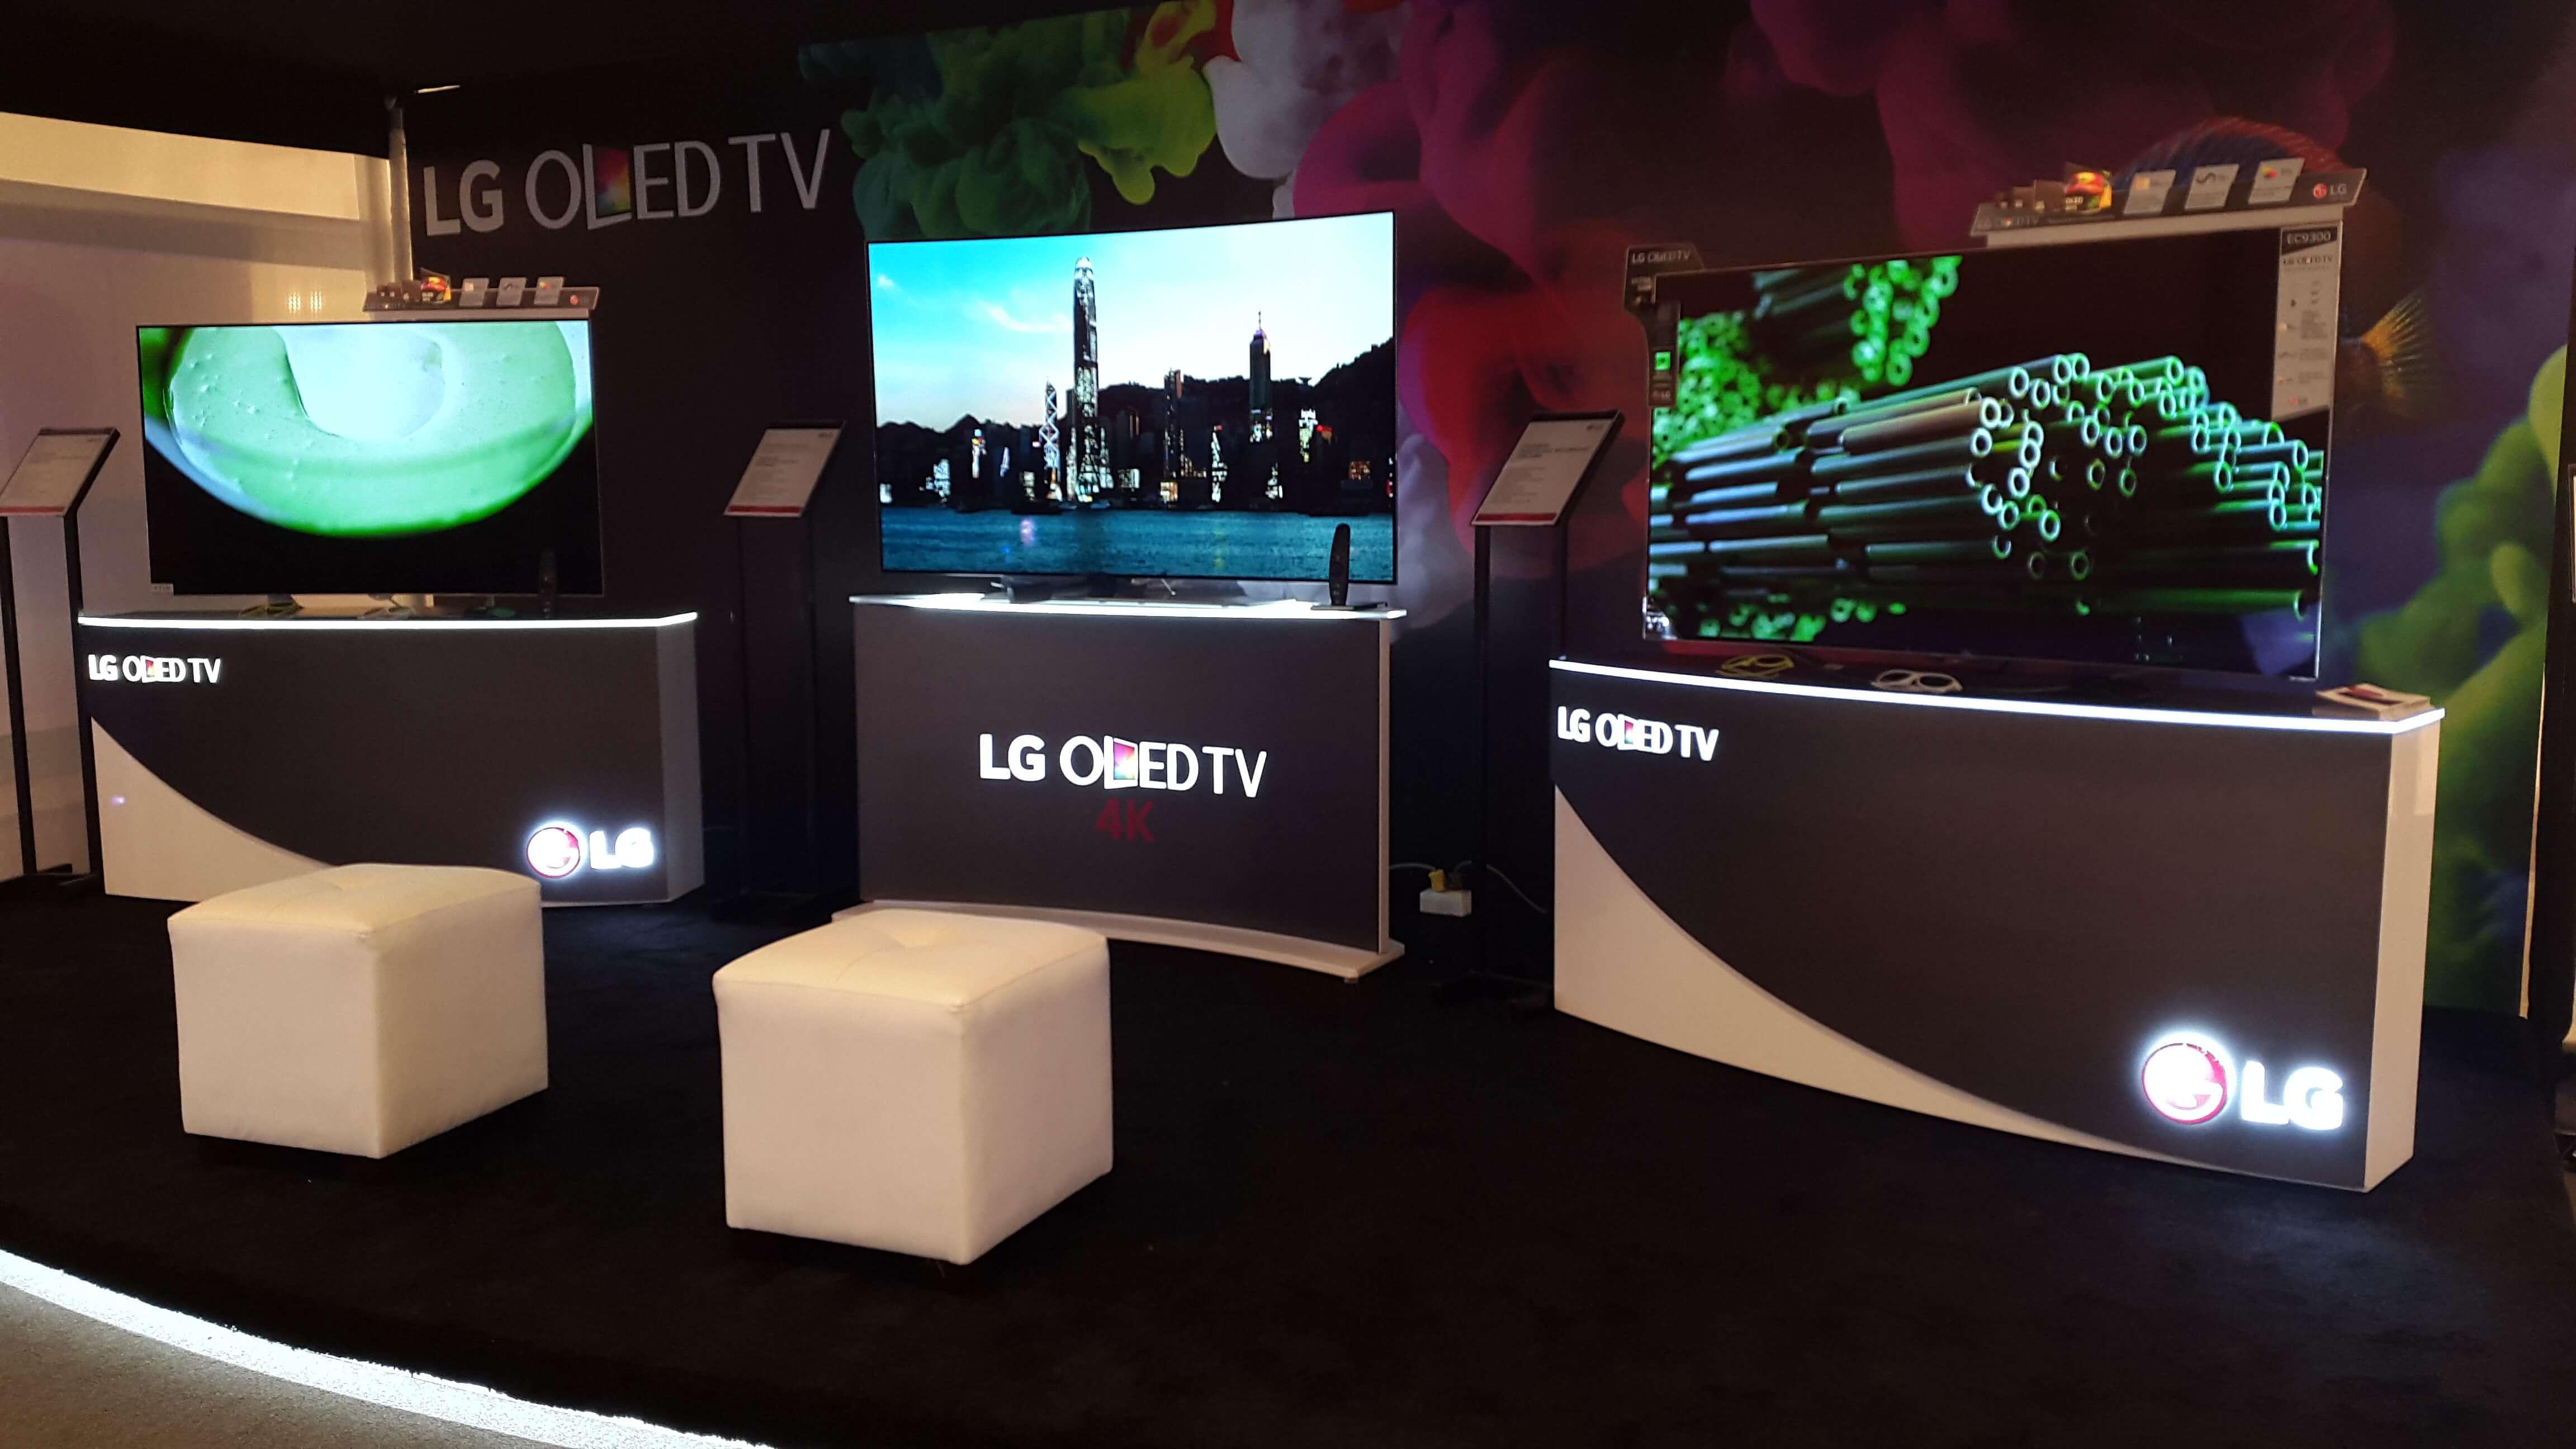 LG March Madness OLED tv bundle deals